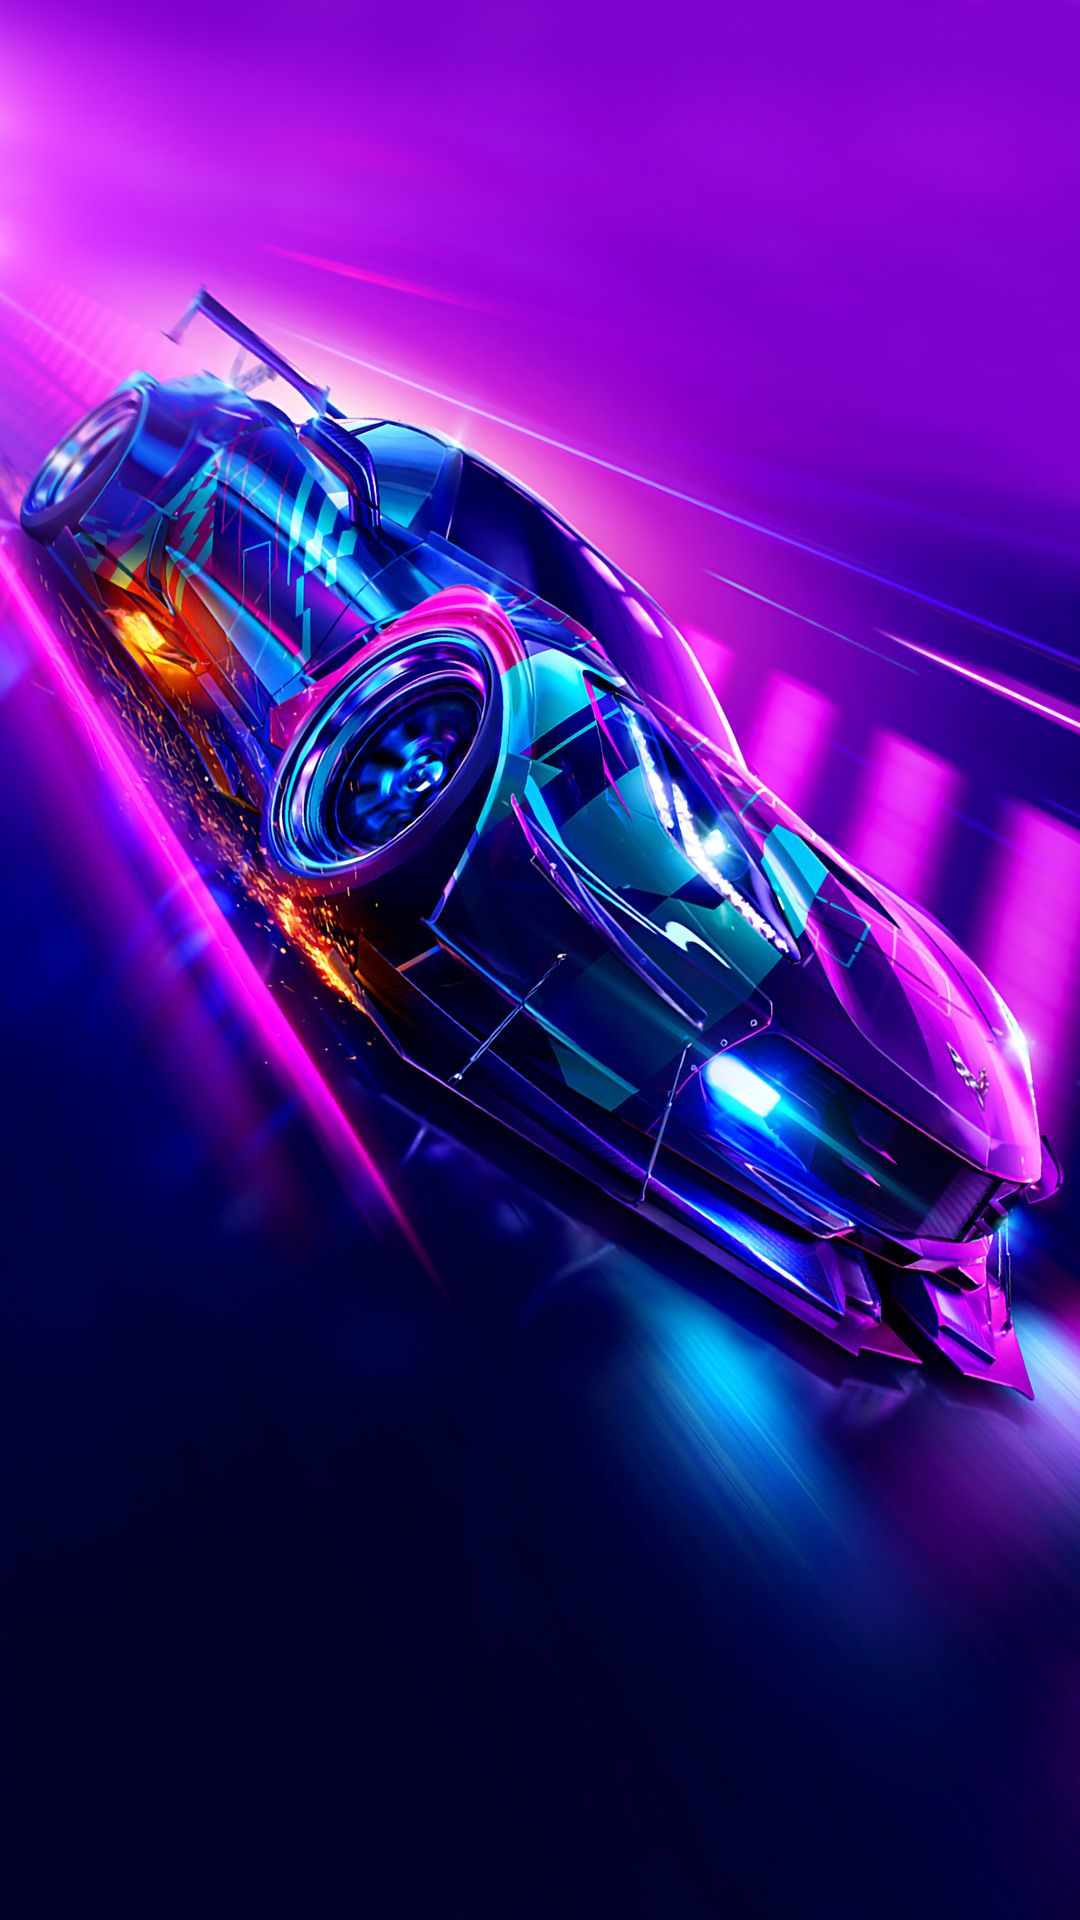 Neon Purple Car Wallpapers - Top Free Neon Purple Car ...